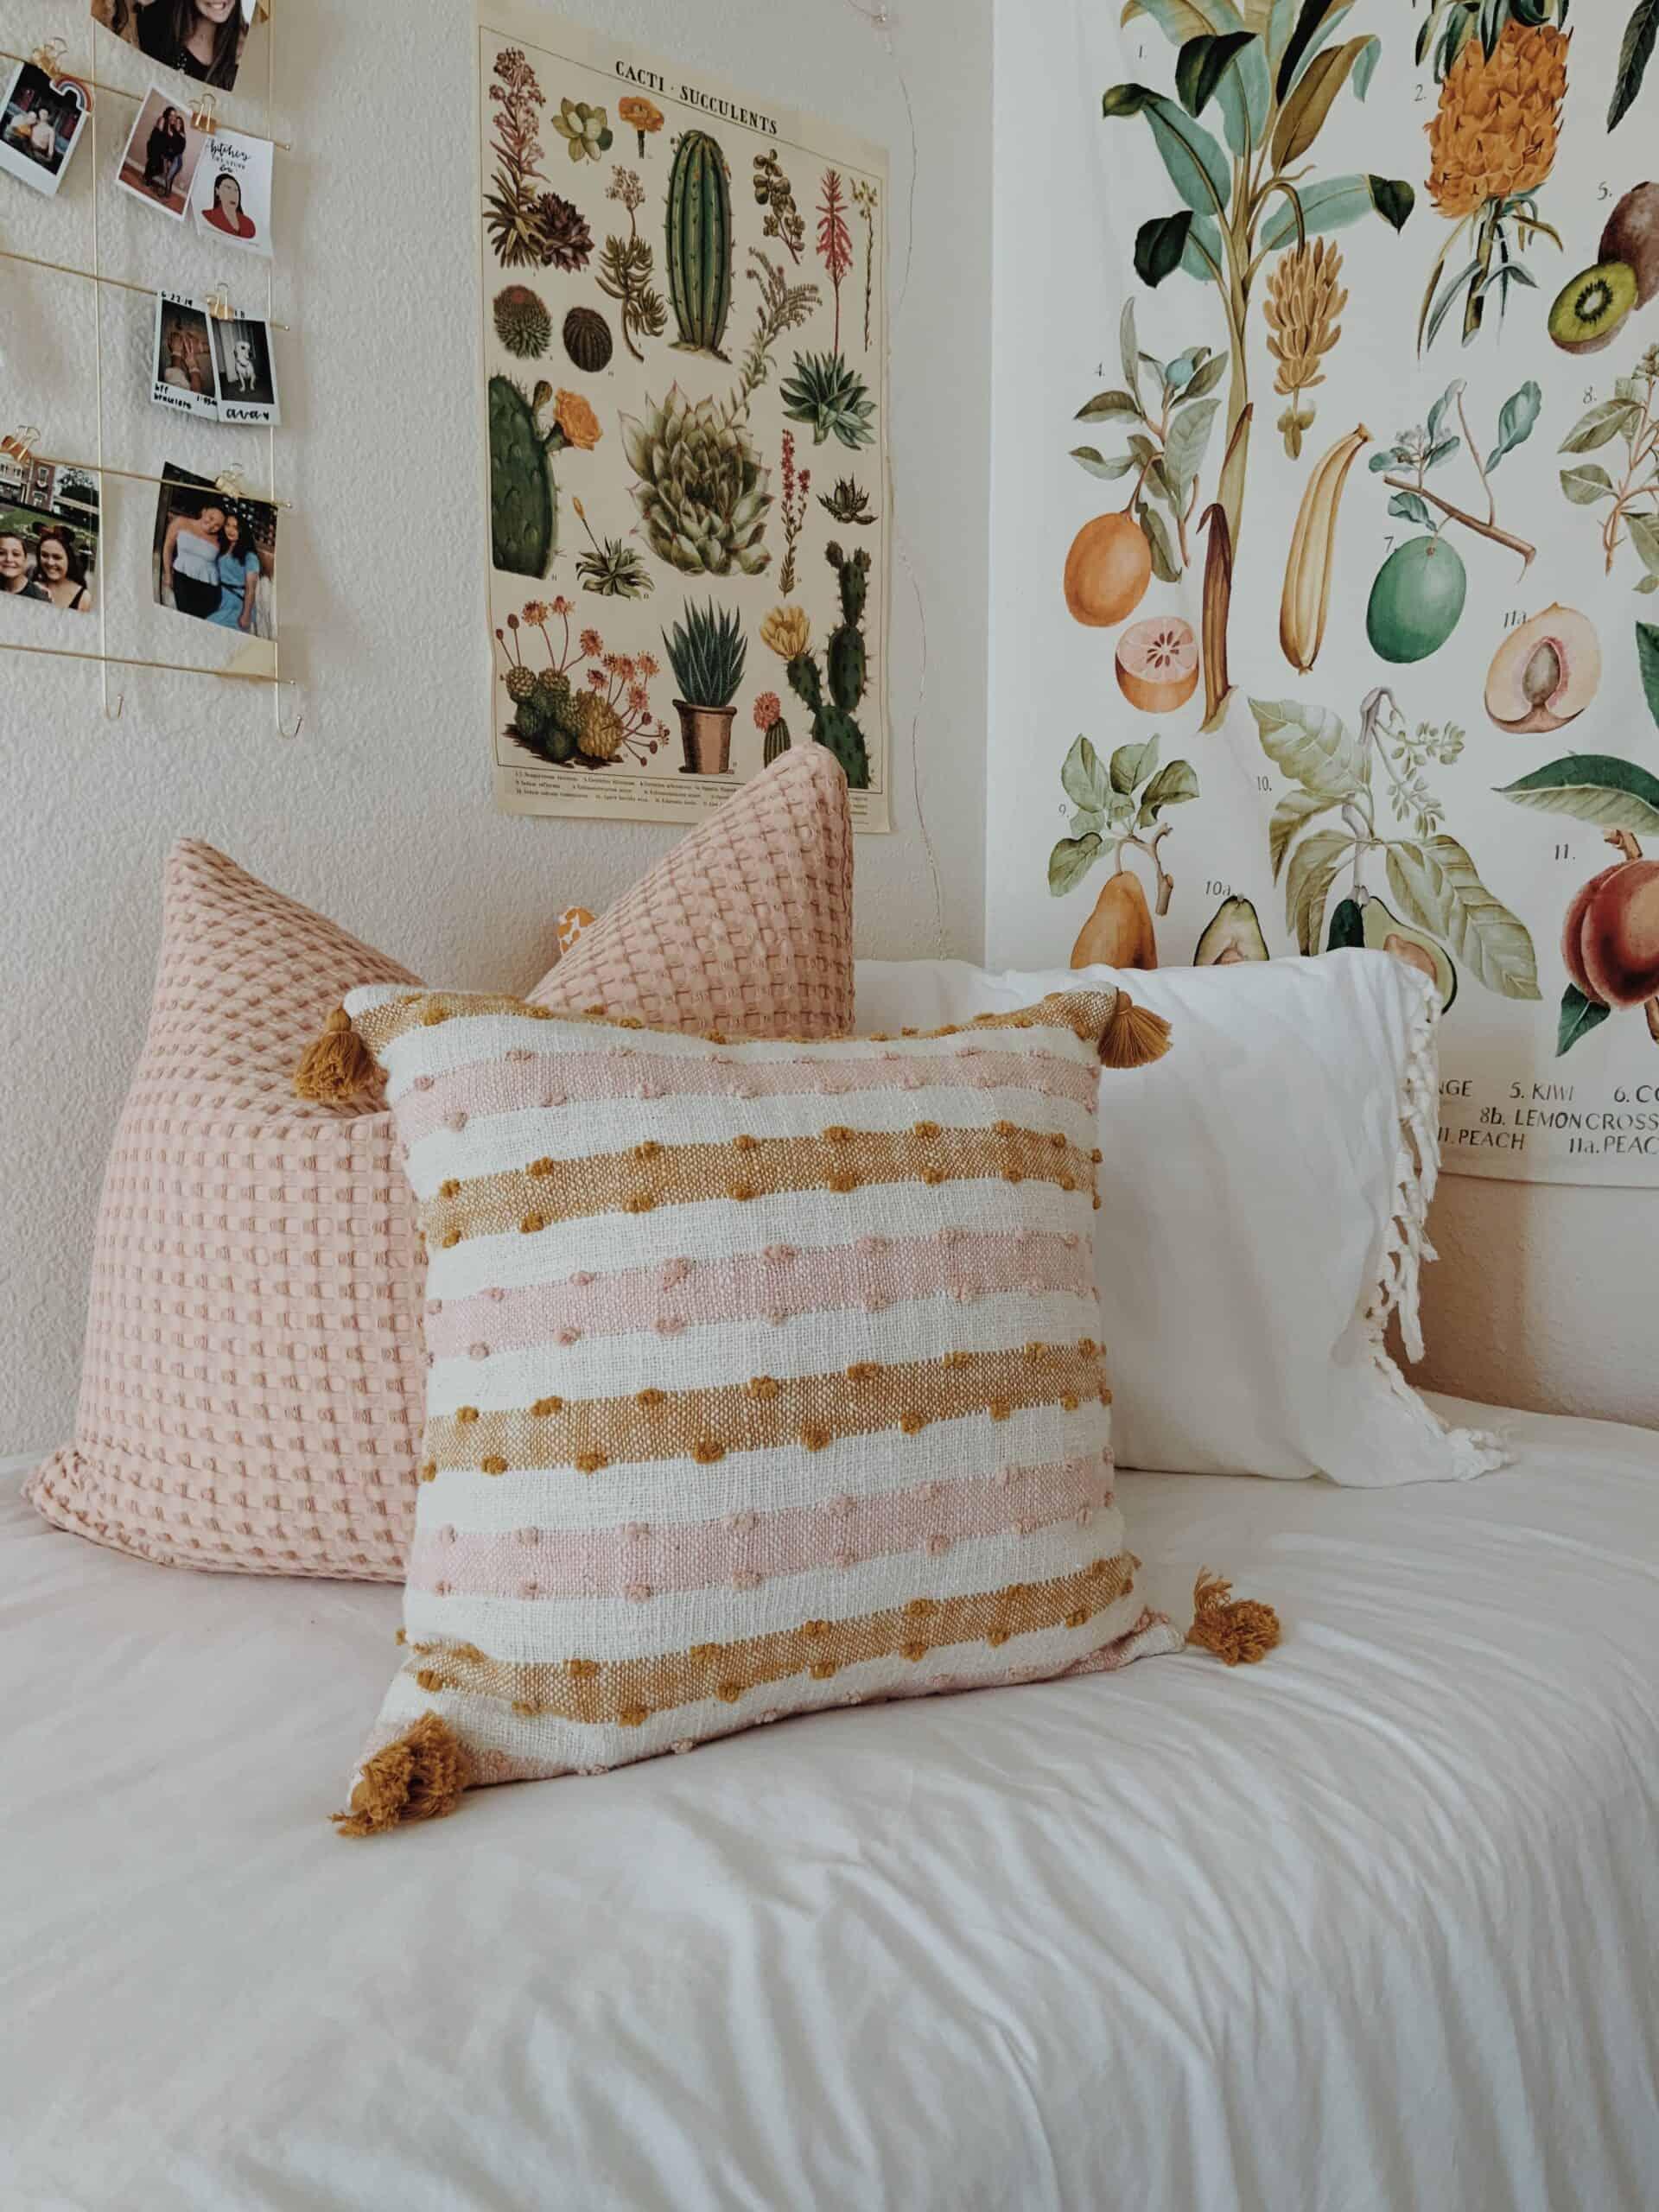 pinterest-college-bedroom-ideas-